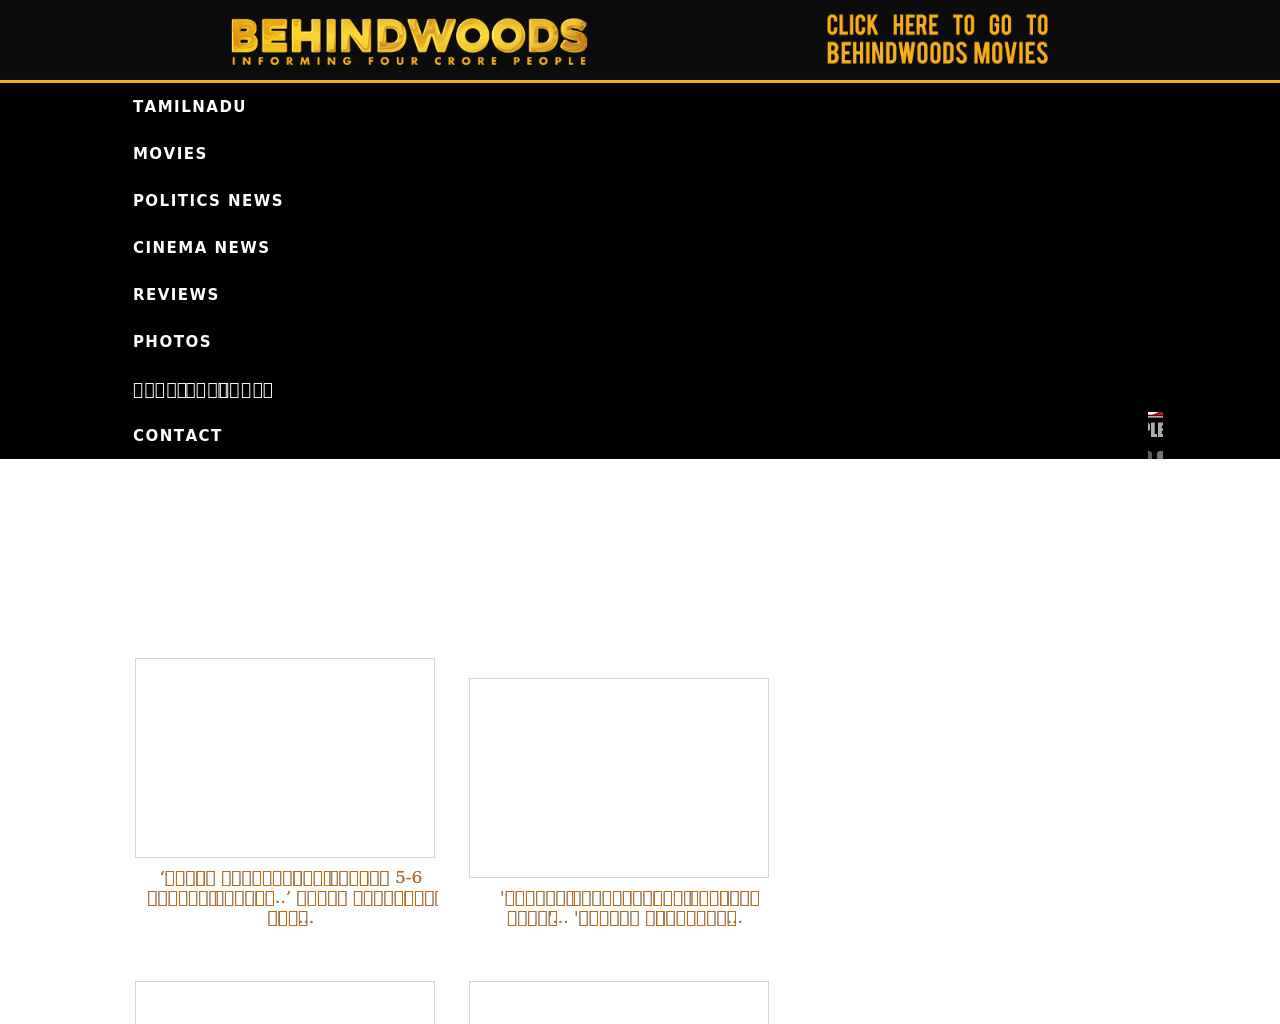 Behindwoods - Entertainment Advertising Mediakits, Reviews